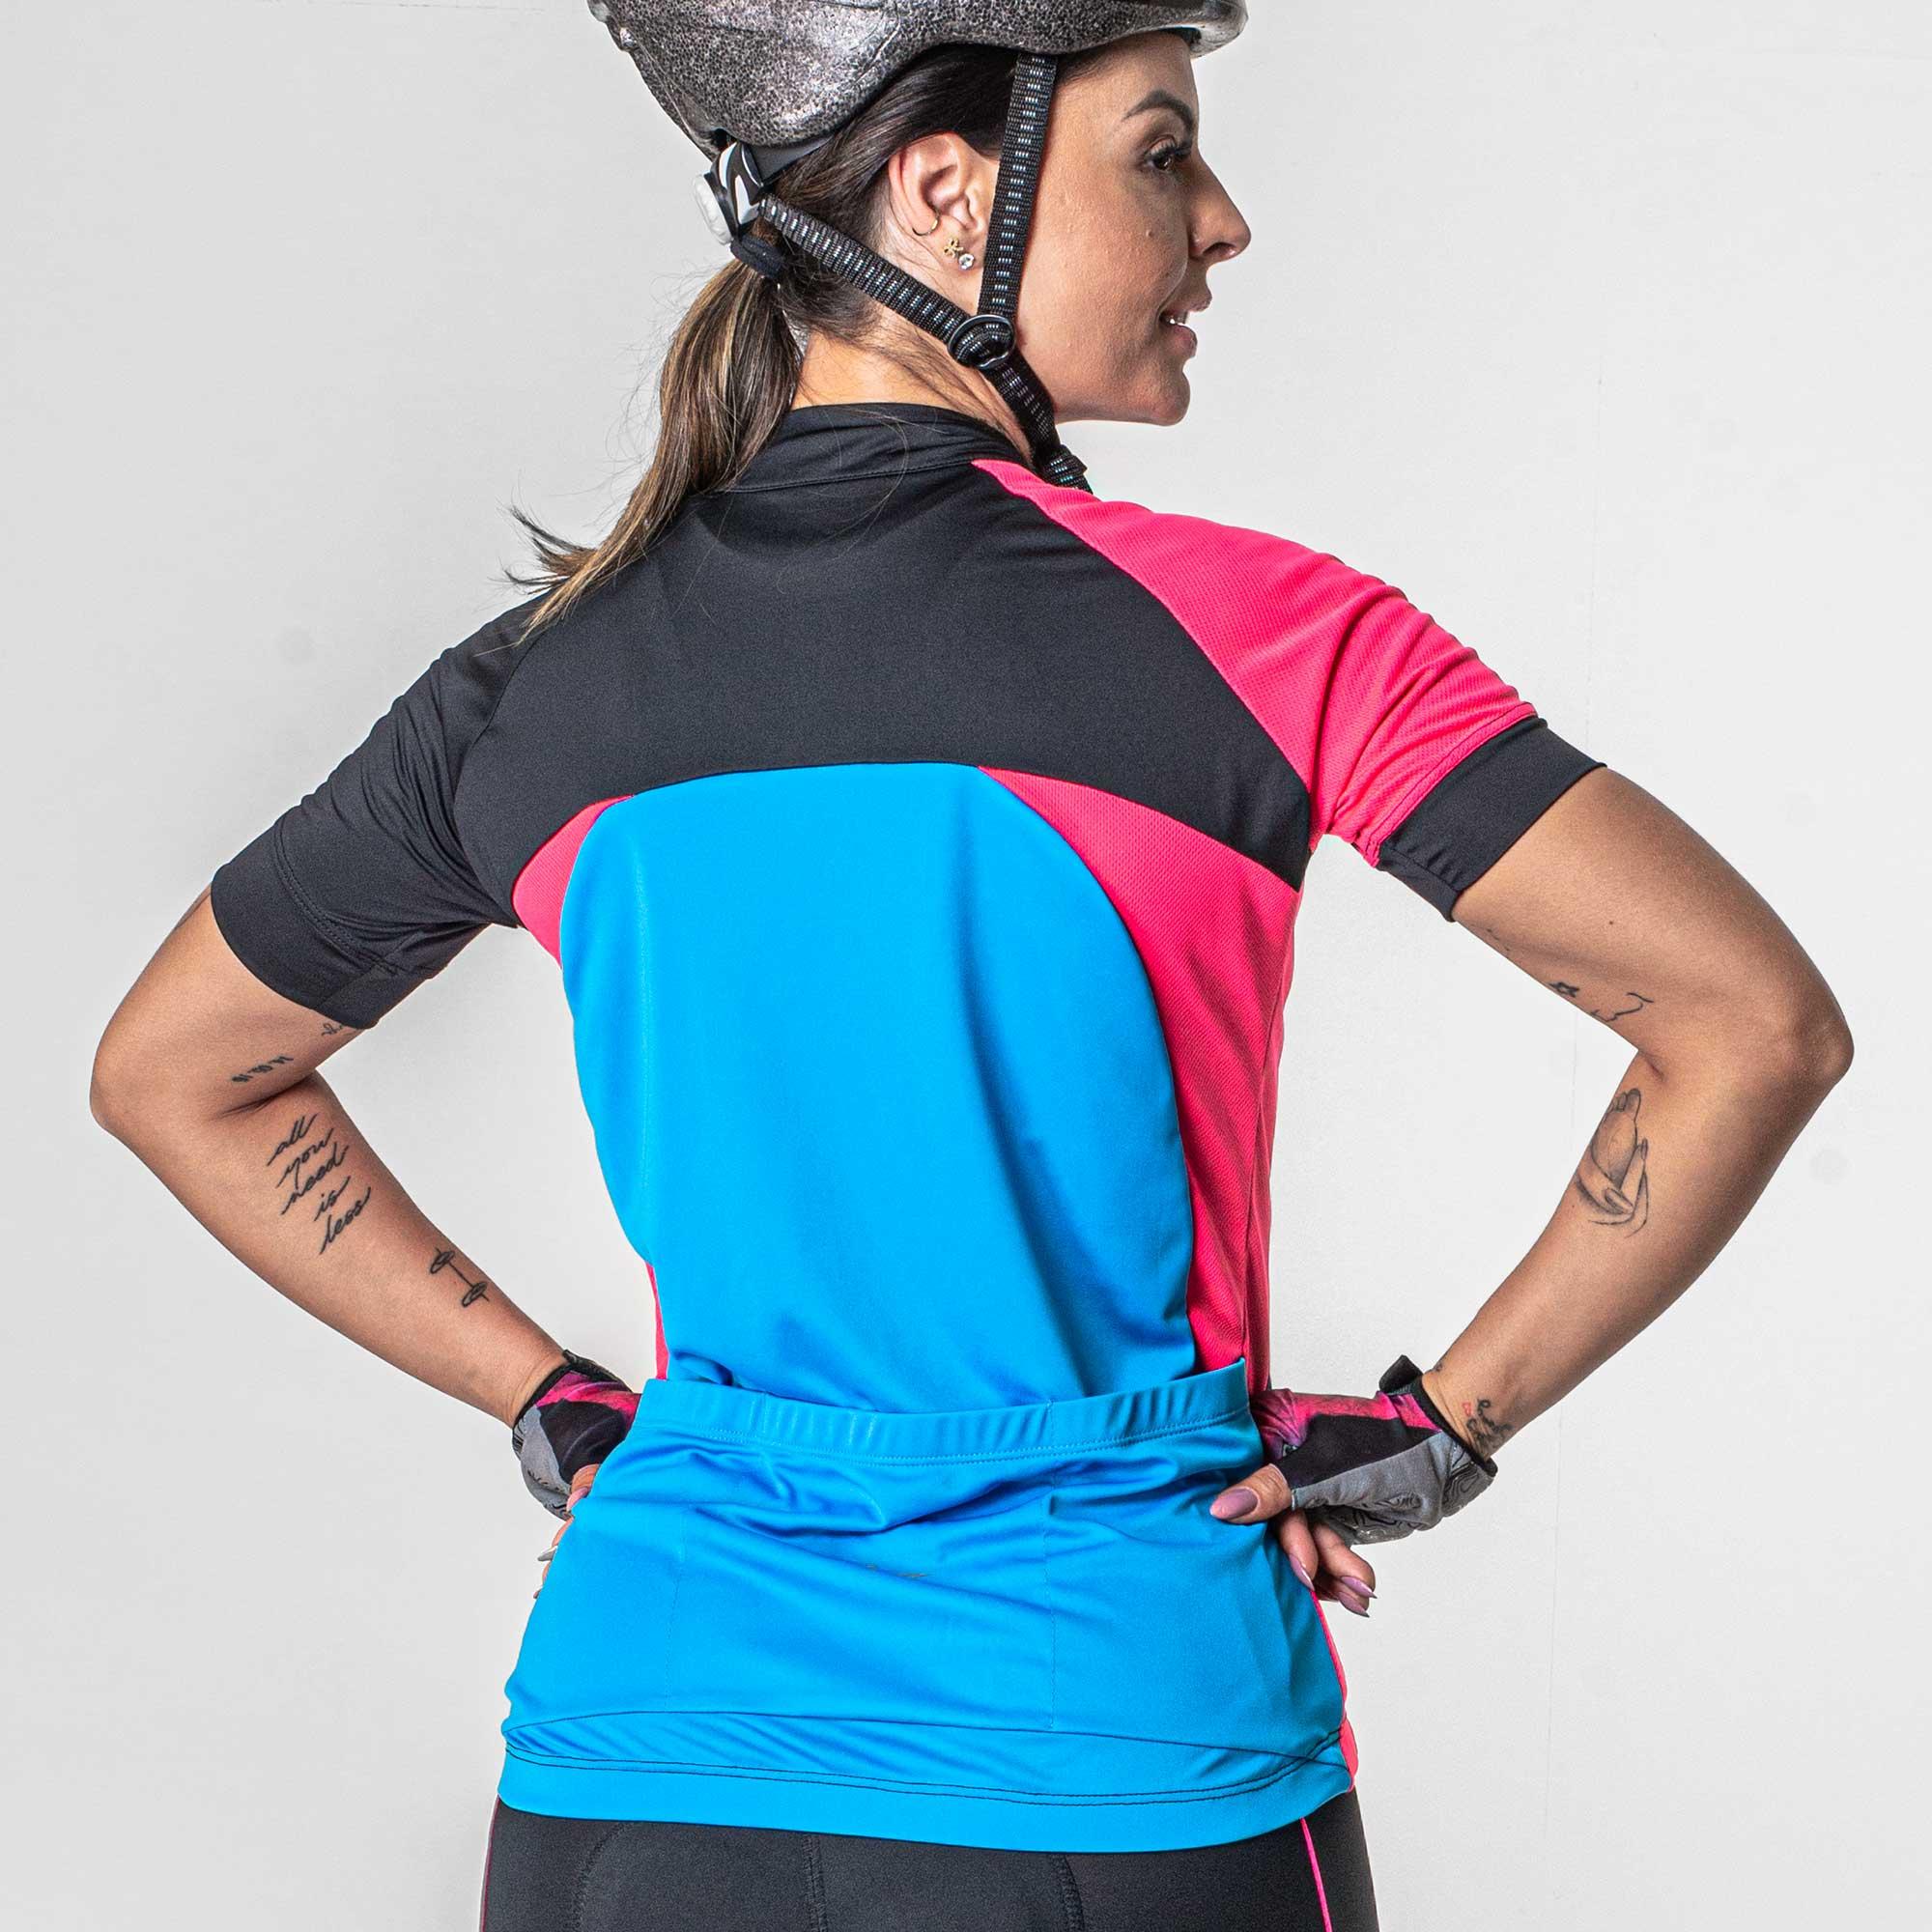 Camisa Ciclismo Feminina Ziper Poker - Original